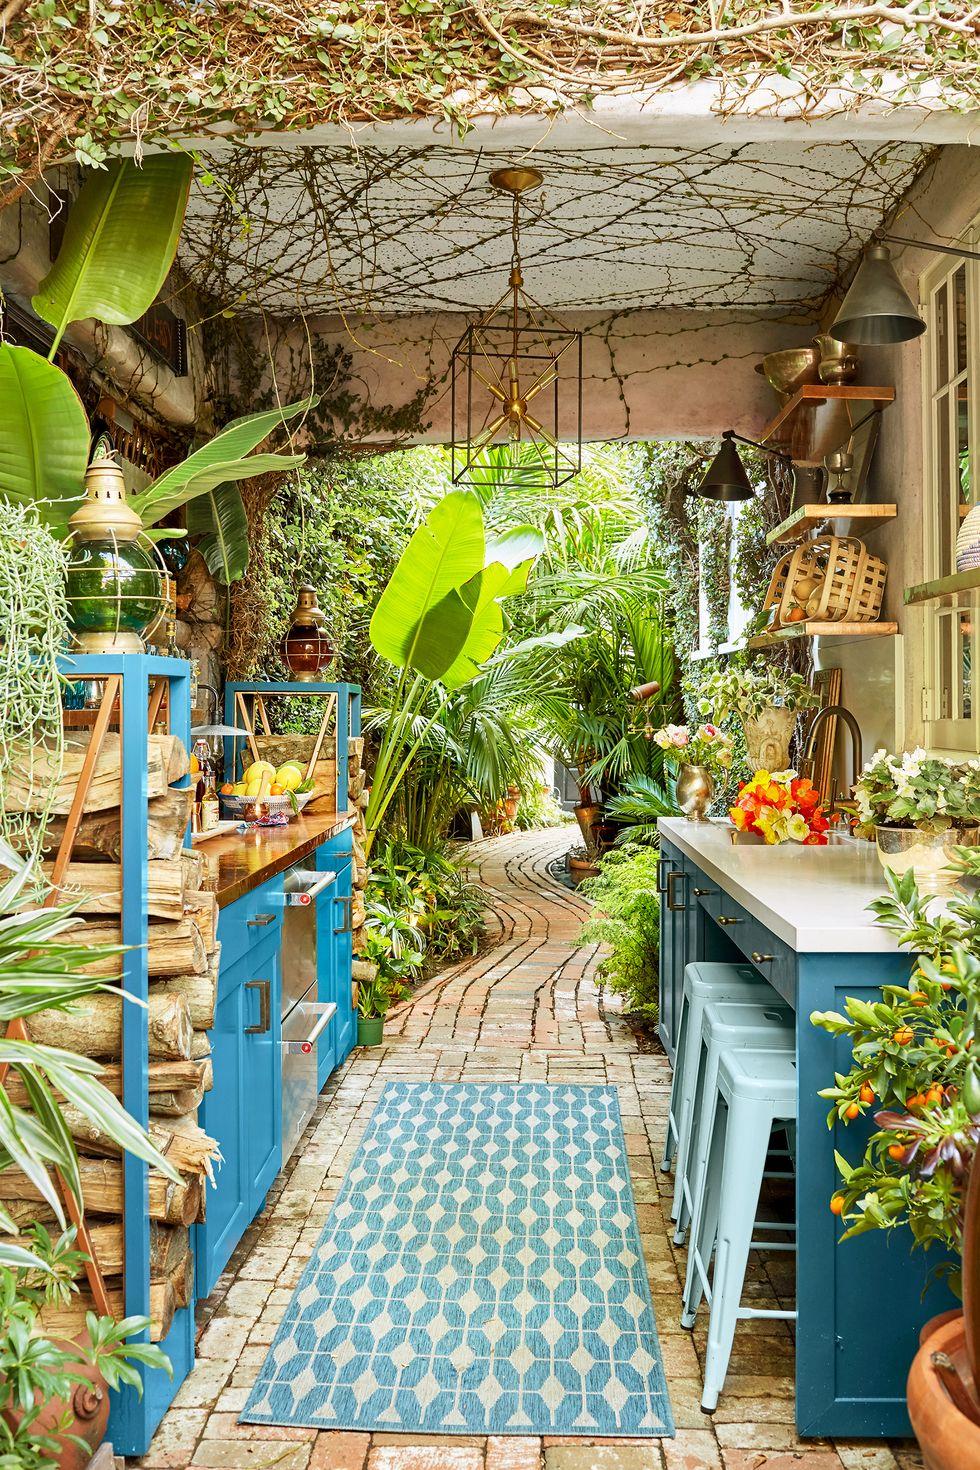 Minimalist Modern Kitchen Design Ideas in The Backyard